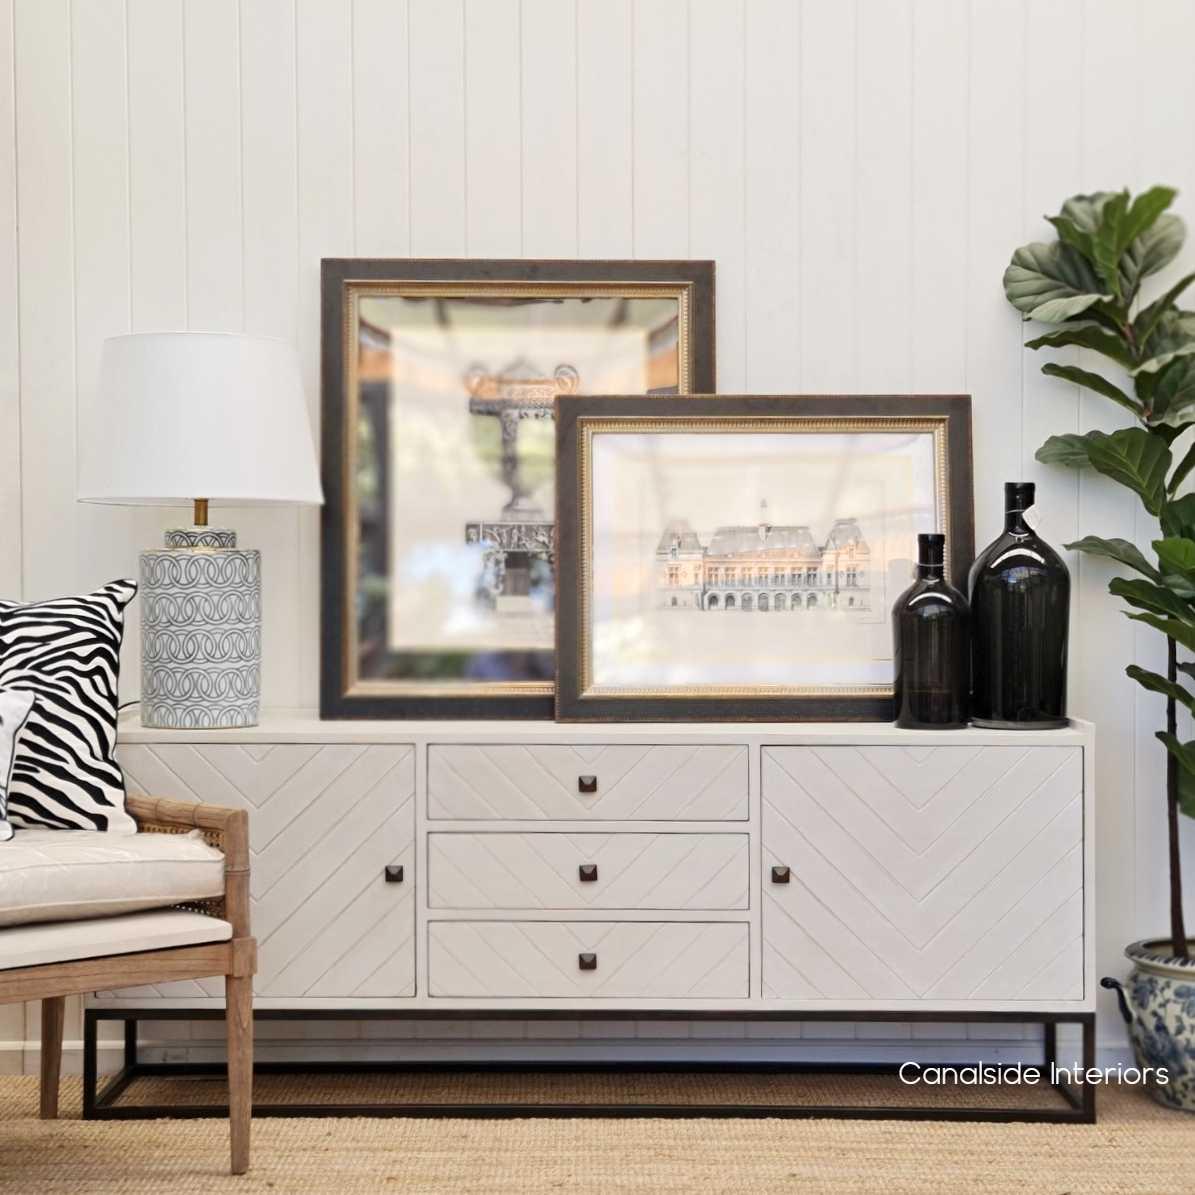 St Lucia Herringbone TV Sideboard Gold HAMPTONS Style, PLANTATION Style, STORAGE Living Room, Hamptons LIVING TV Media & Storage, TABLES Sideboards & Buffets, STORAGE, STORAGE Sideboards & Buffets